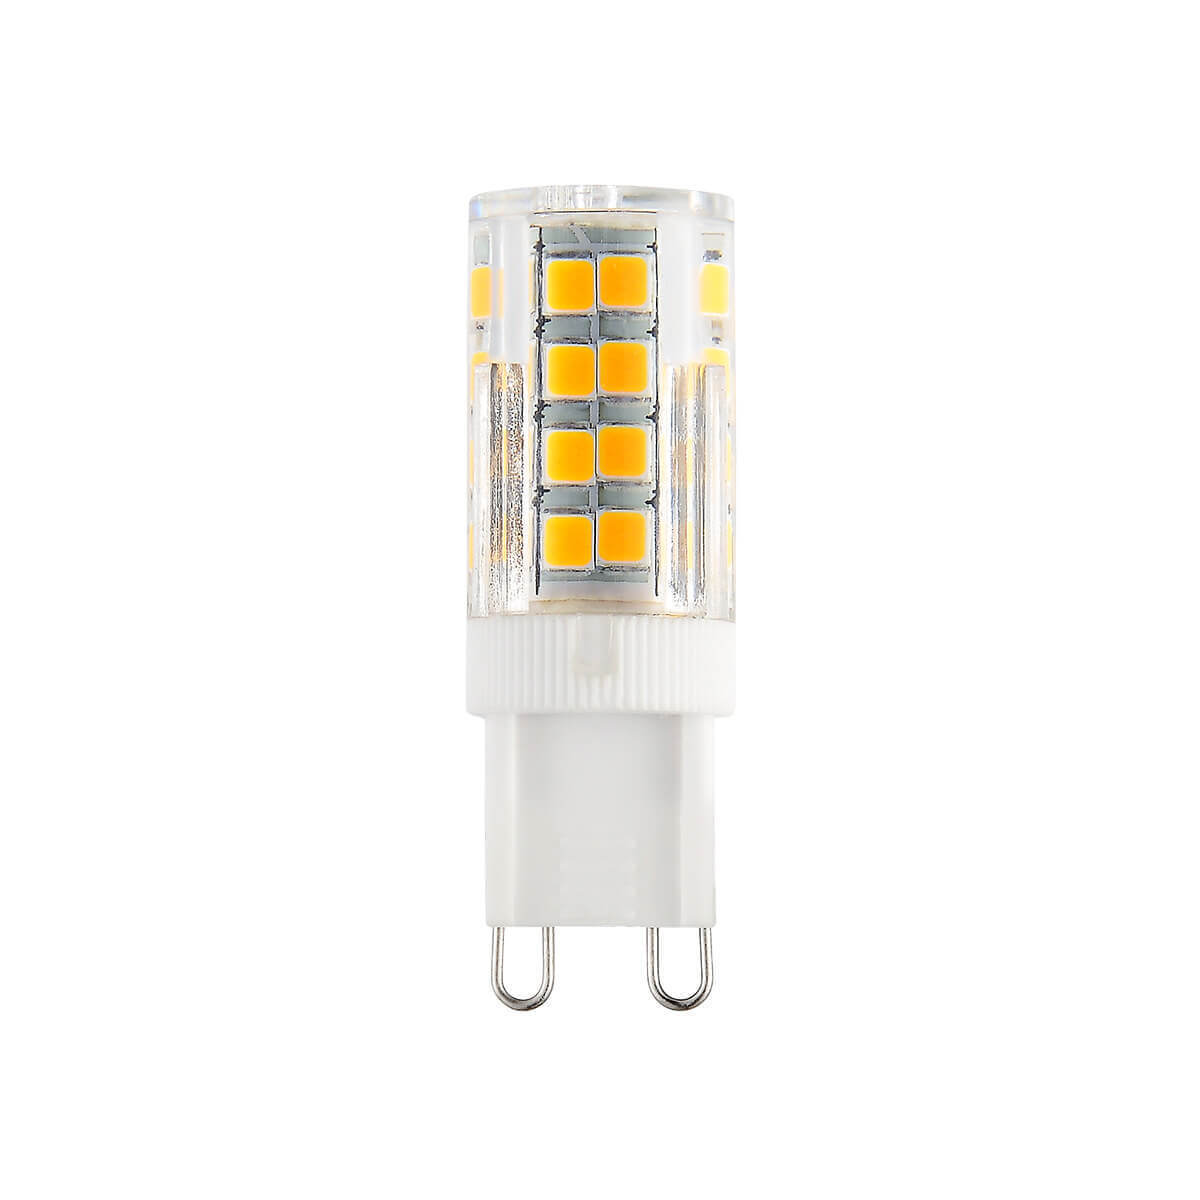 Лампа светодиодная G9 7W 3300K прозрачная 4690389112980 a800 f7 g9t g9 7 a770 g95 root